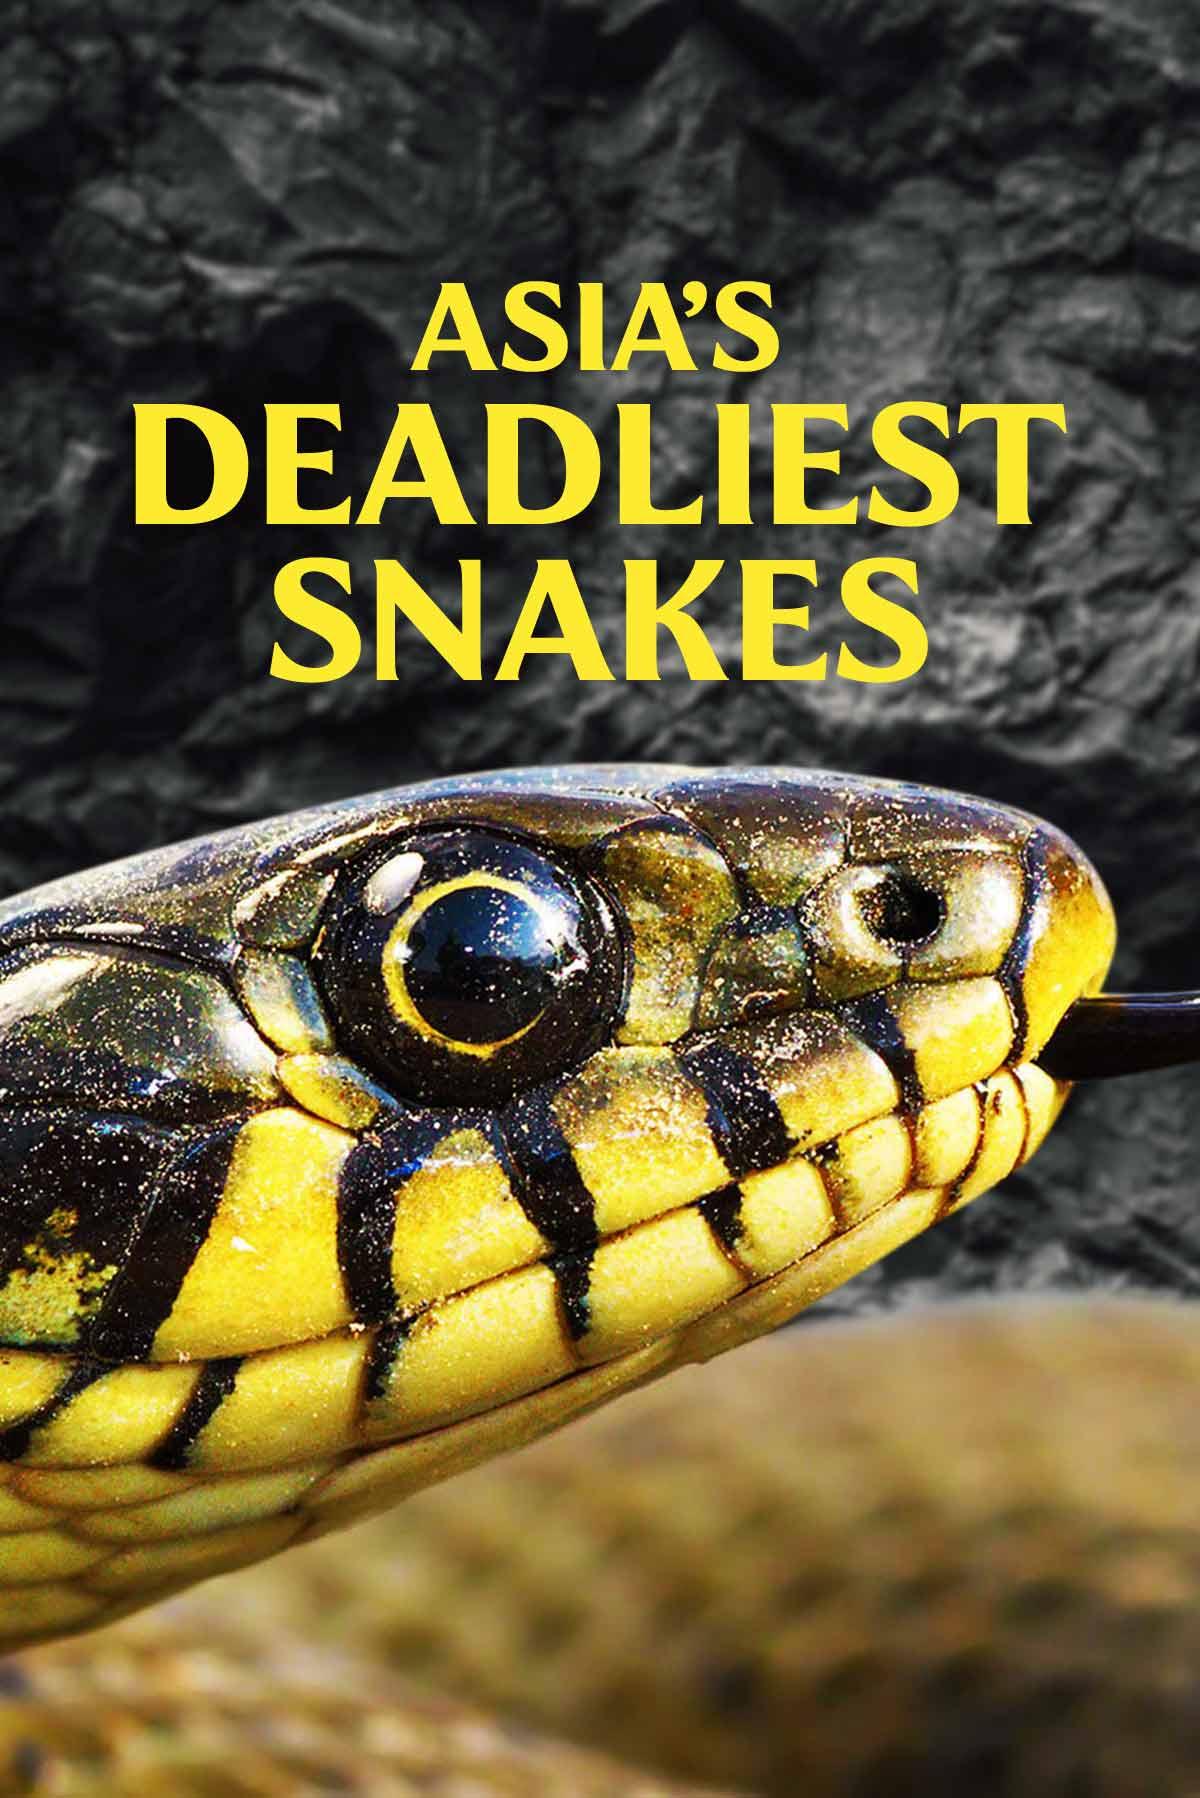 Asia's Deadliest Snakes